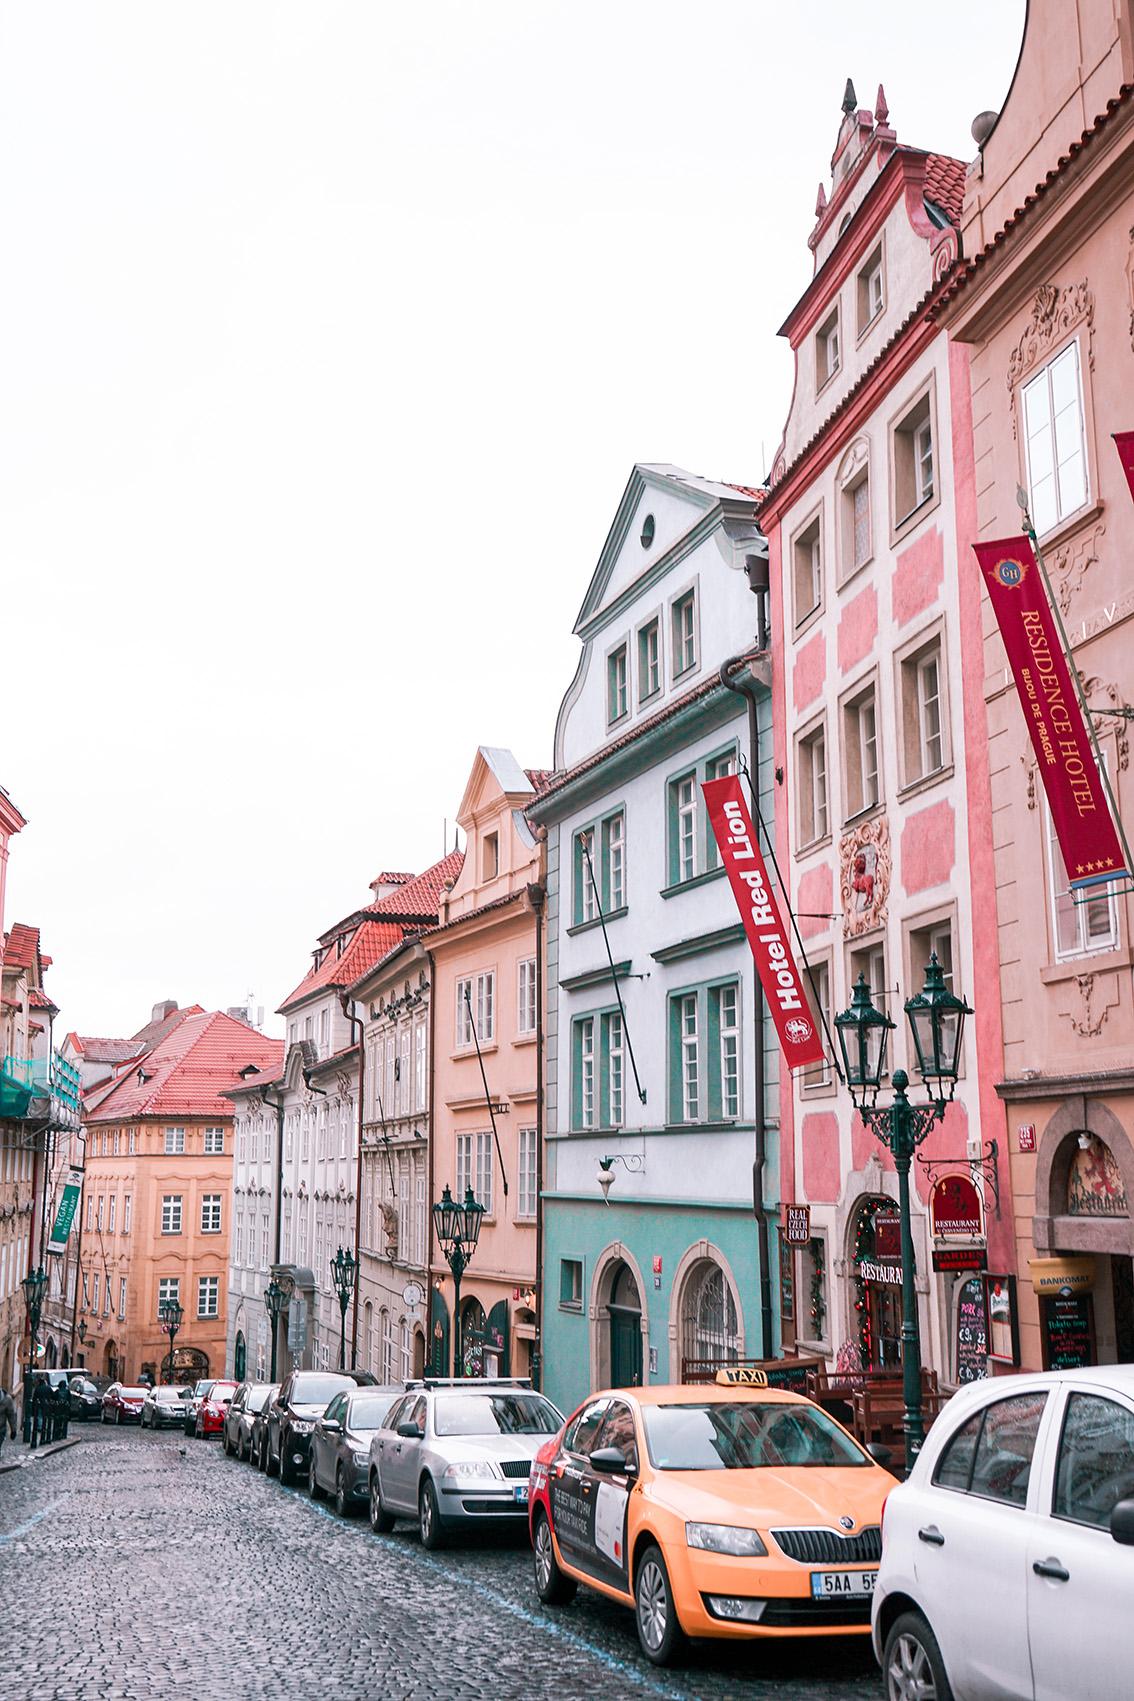 13 Weekend a Praga: 7 cose da vedere, dove dormire, gli indirizzi food e i Mercatini di Natale più belli.